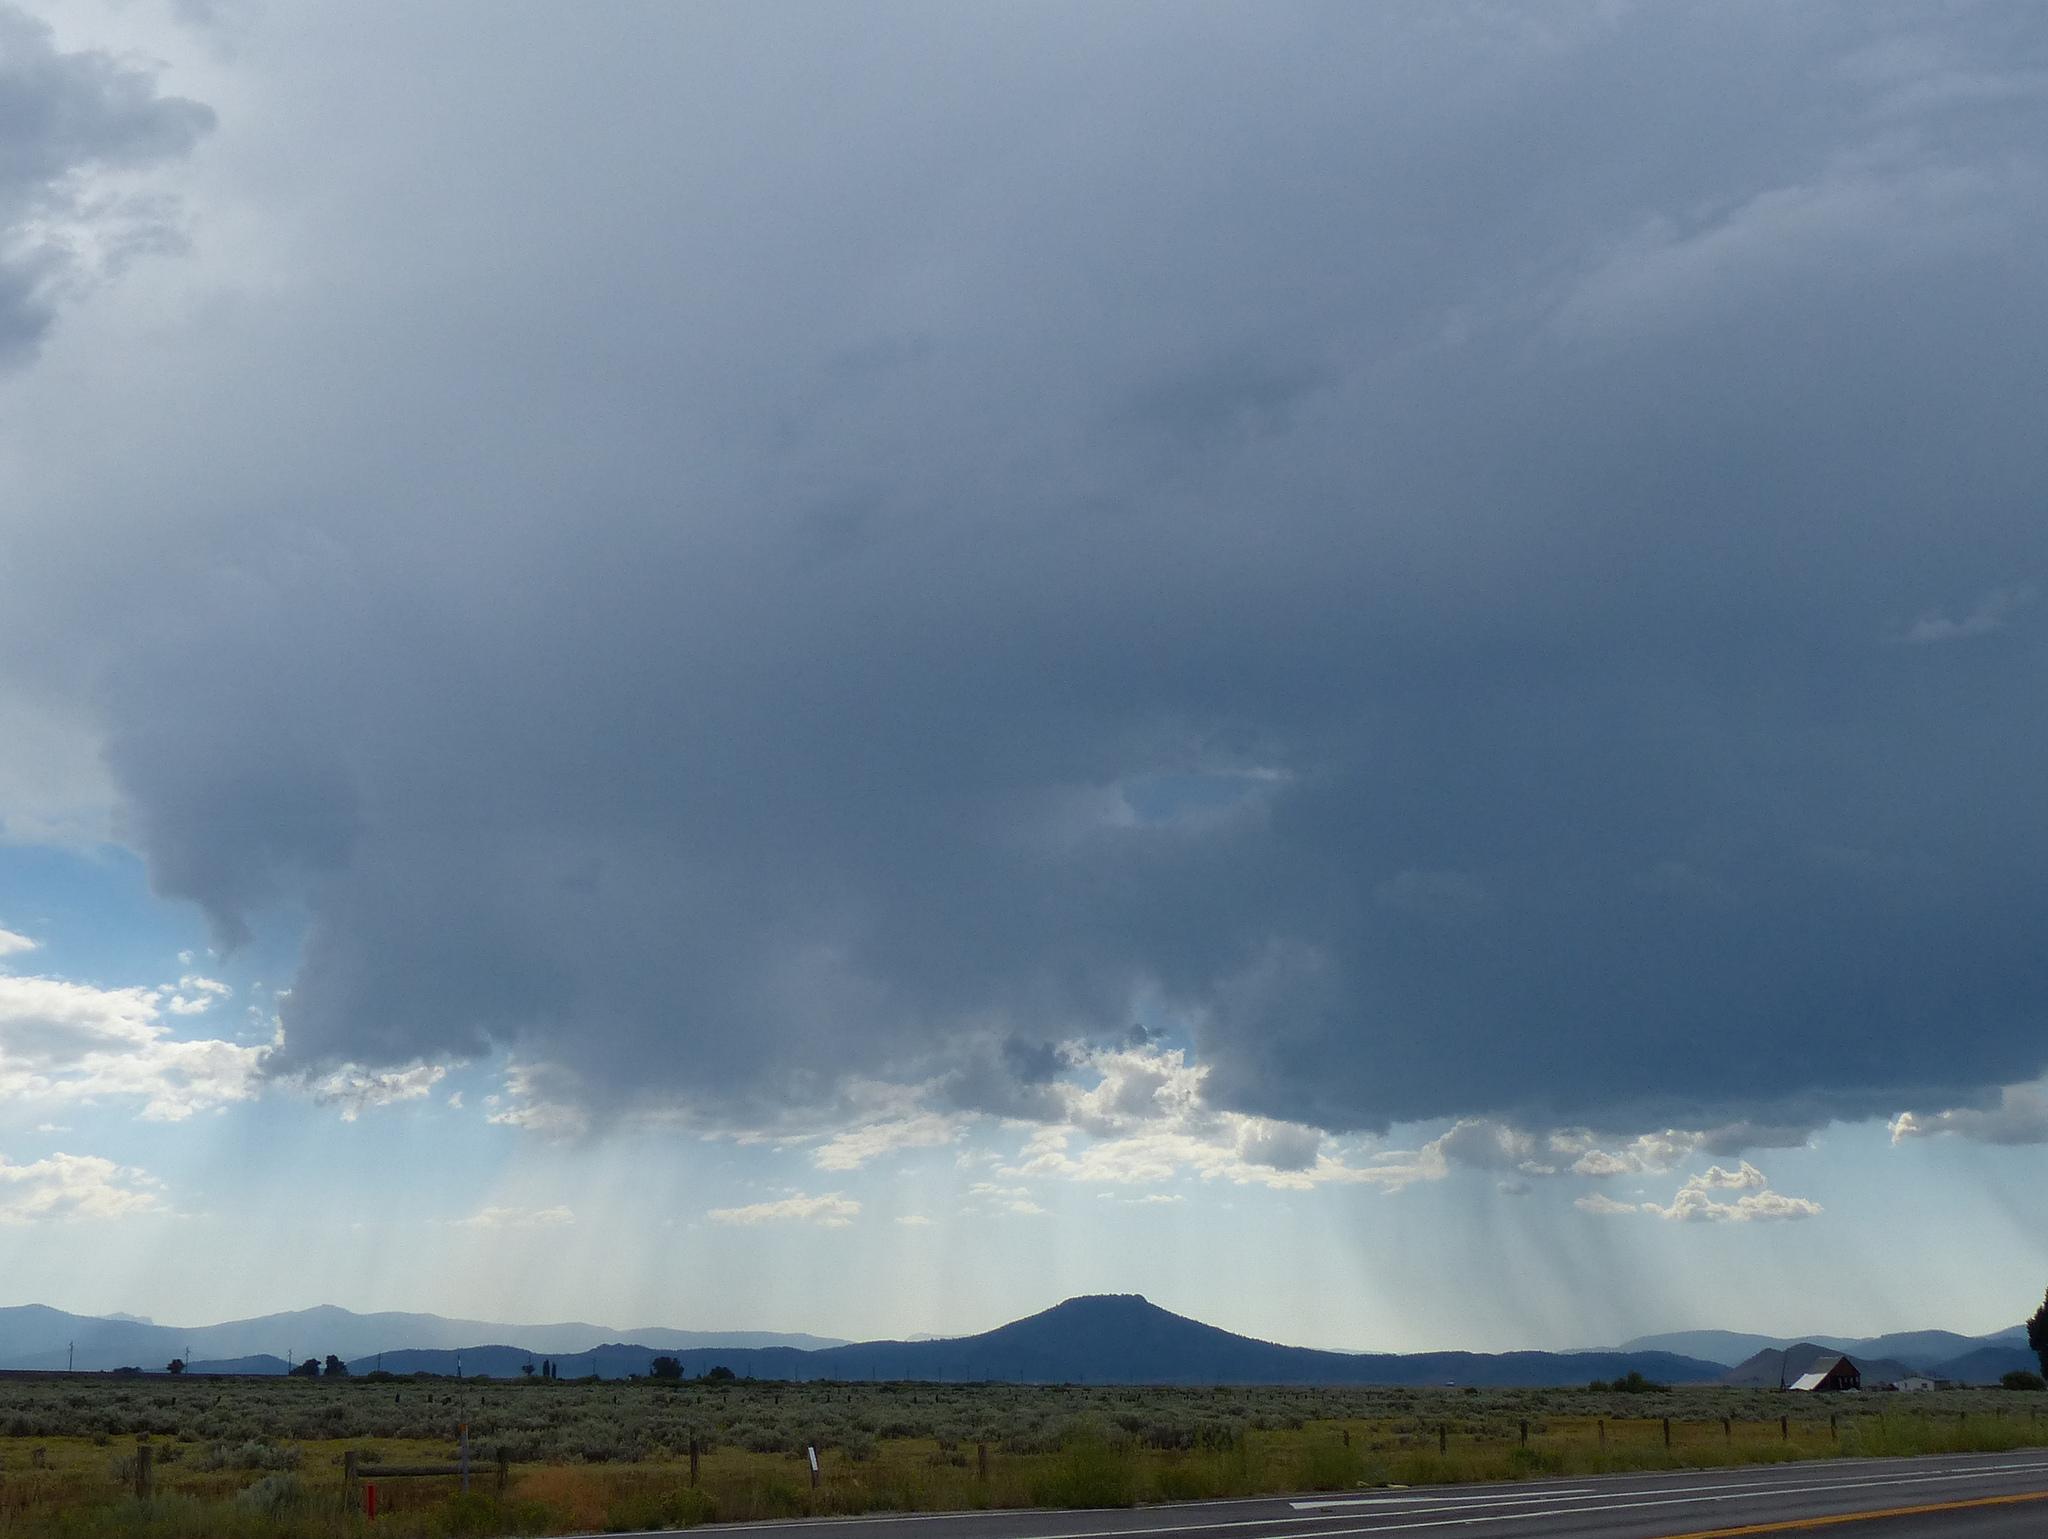 Storm over Portola, CA